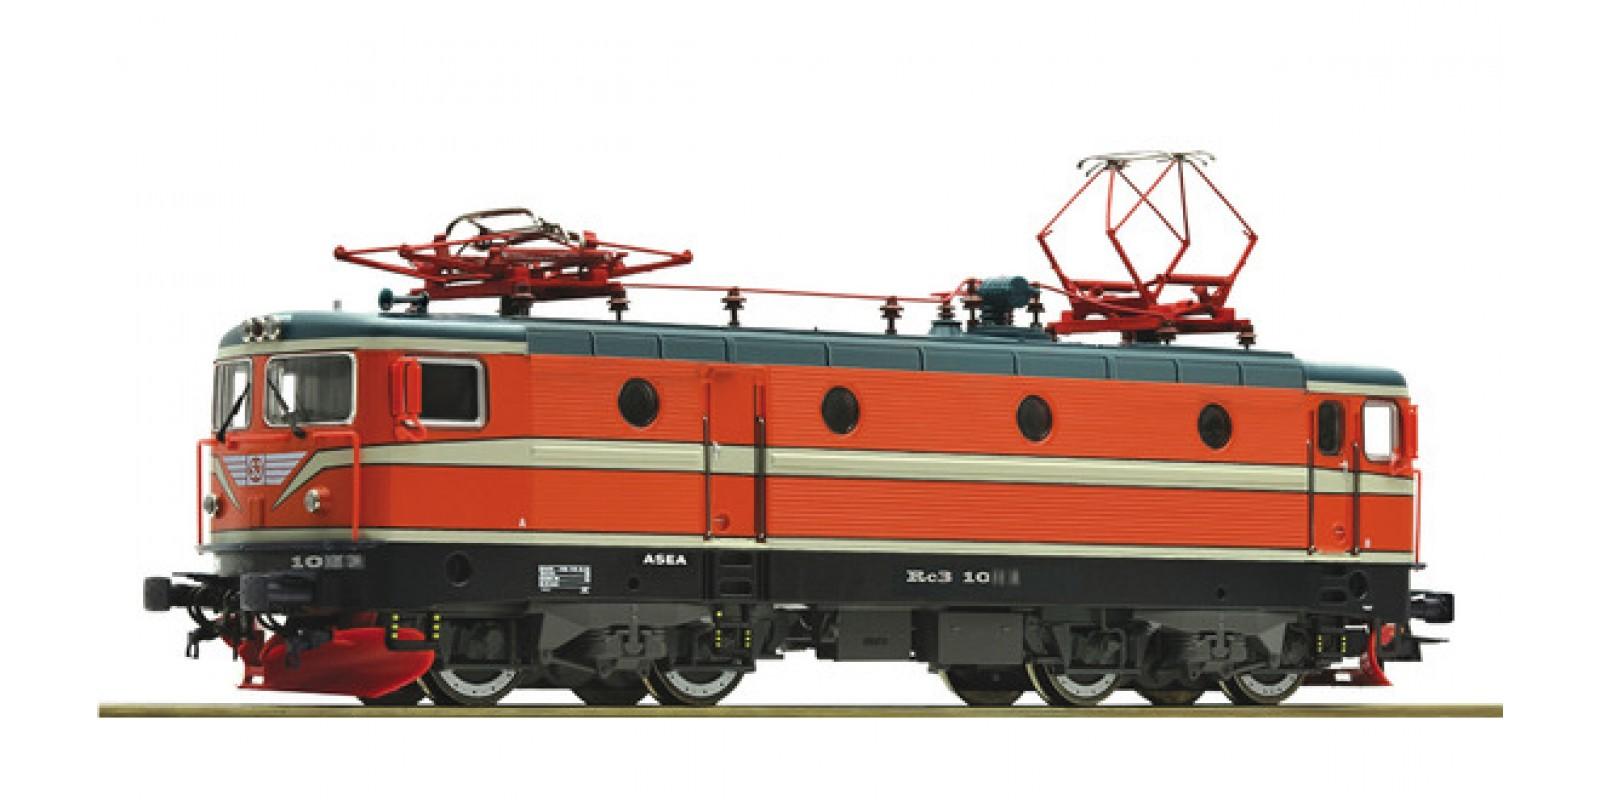 RO79395 - Electric locomotive Rc3, SJ